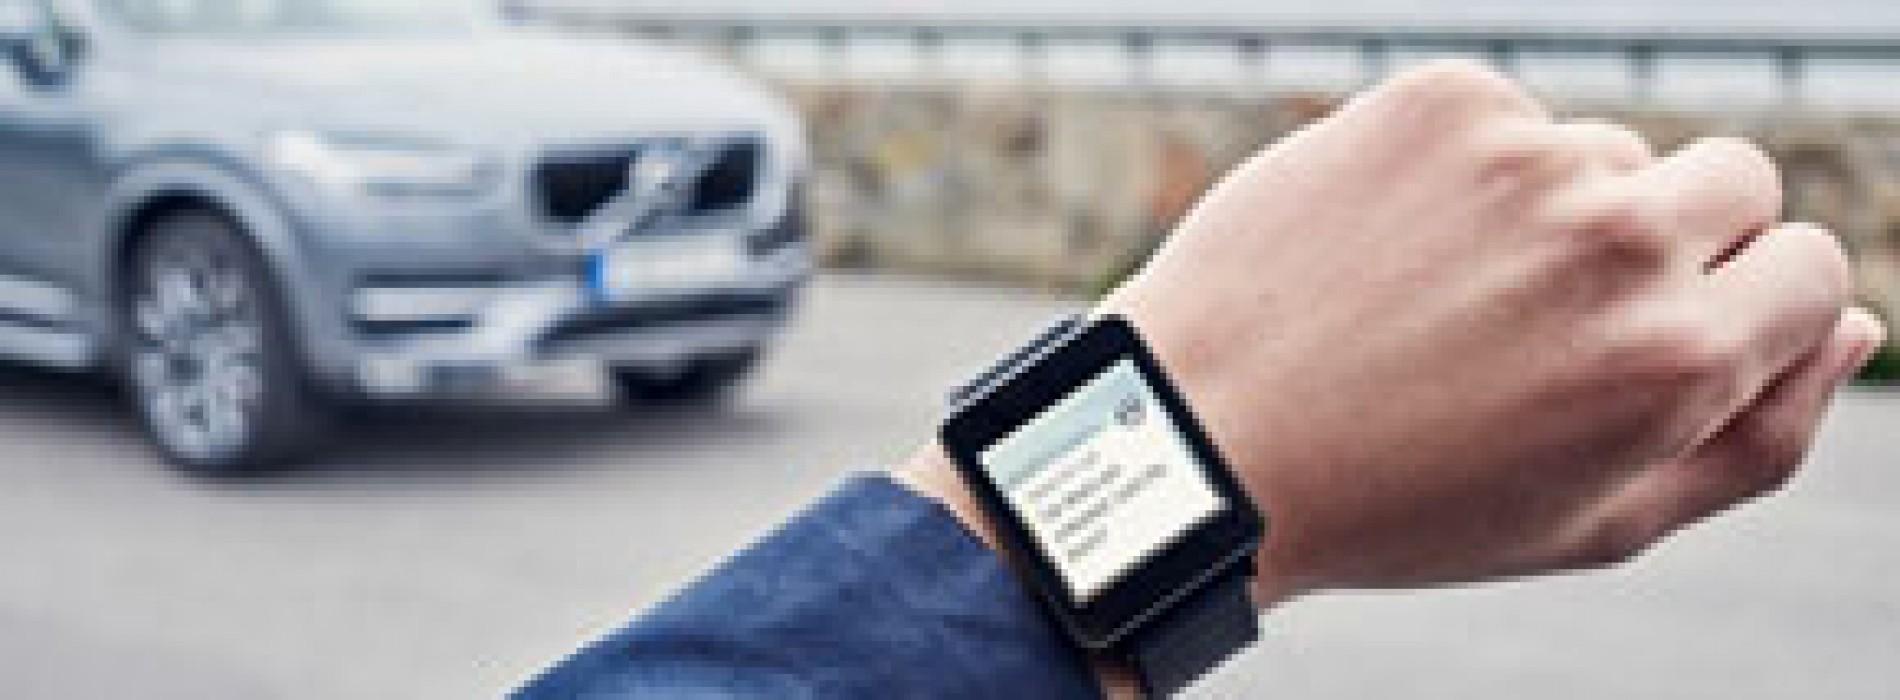 Controla tu auto desde tu apple watch